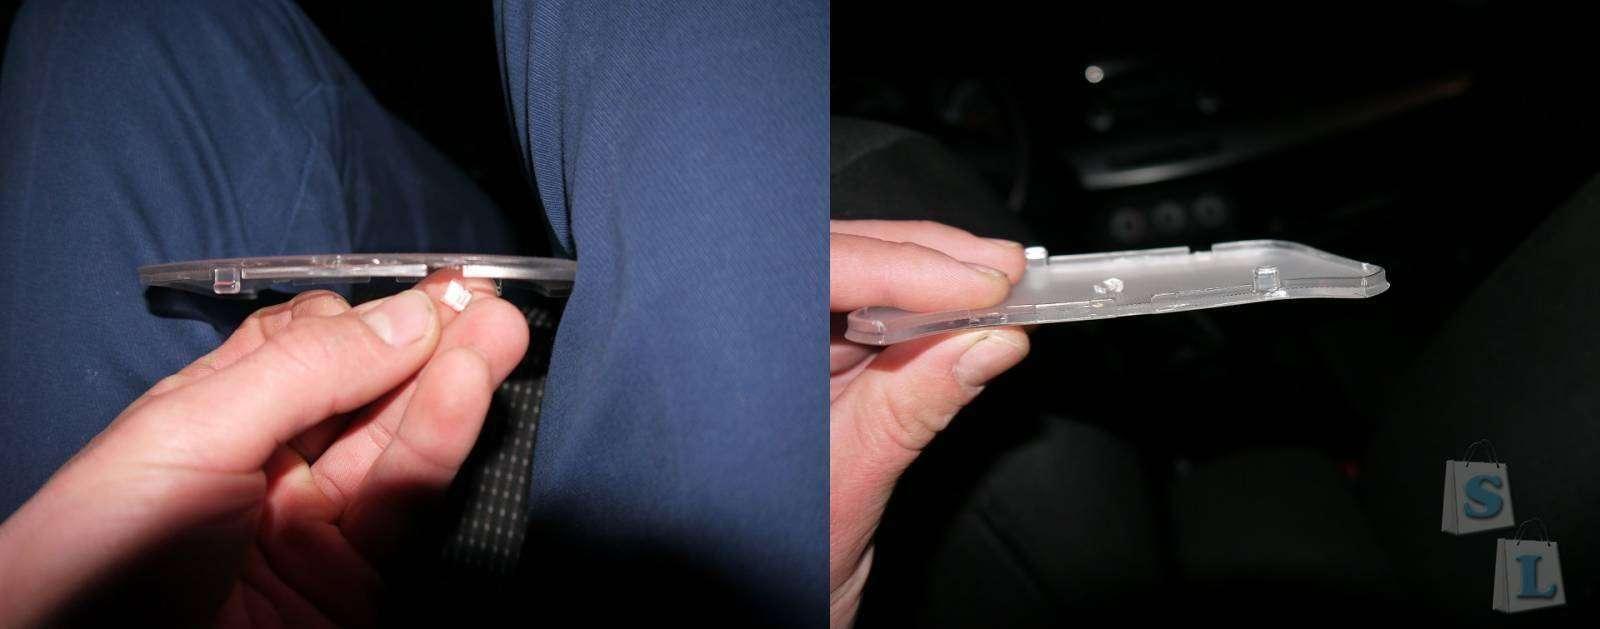 Aliexpress: Пластиковые монтировки для снятия обшивки автомобиля